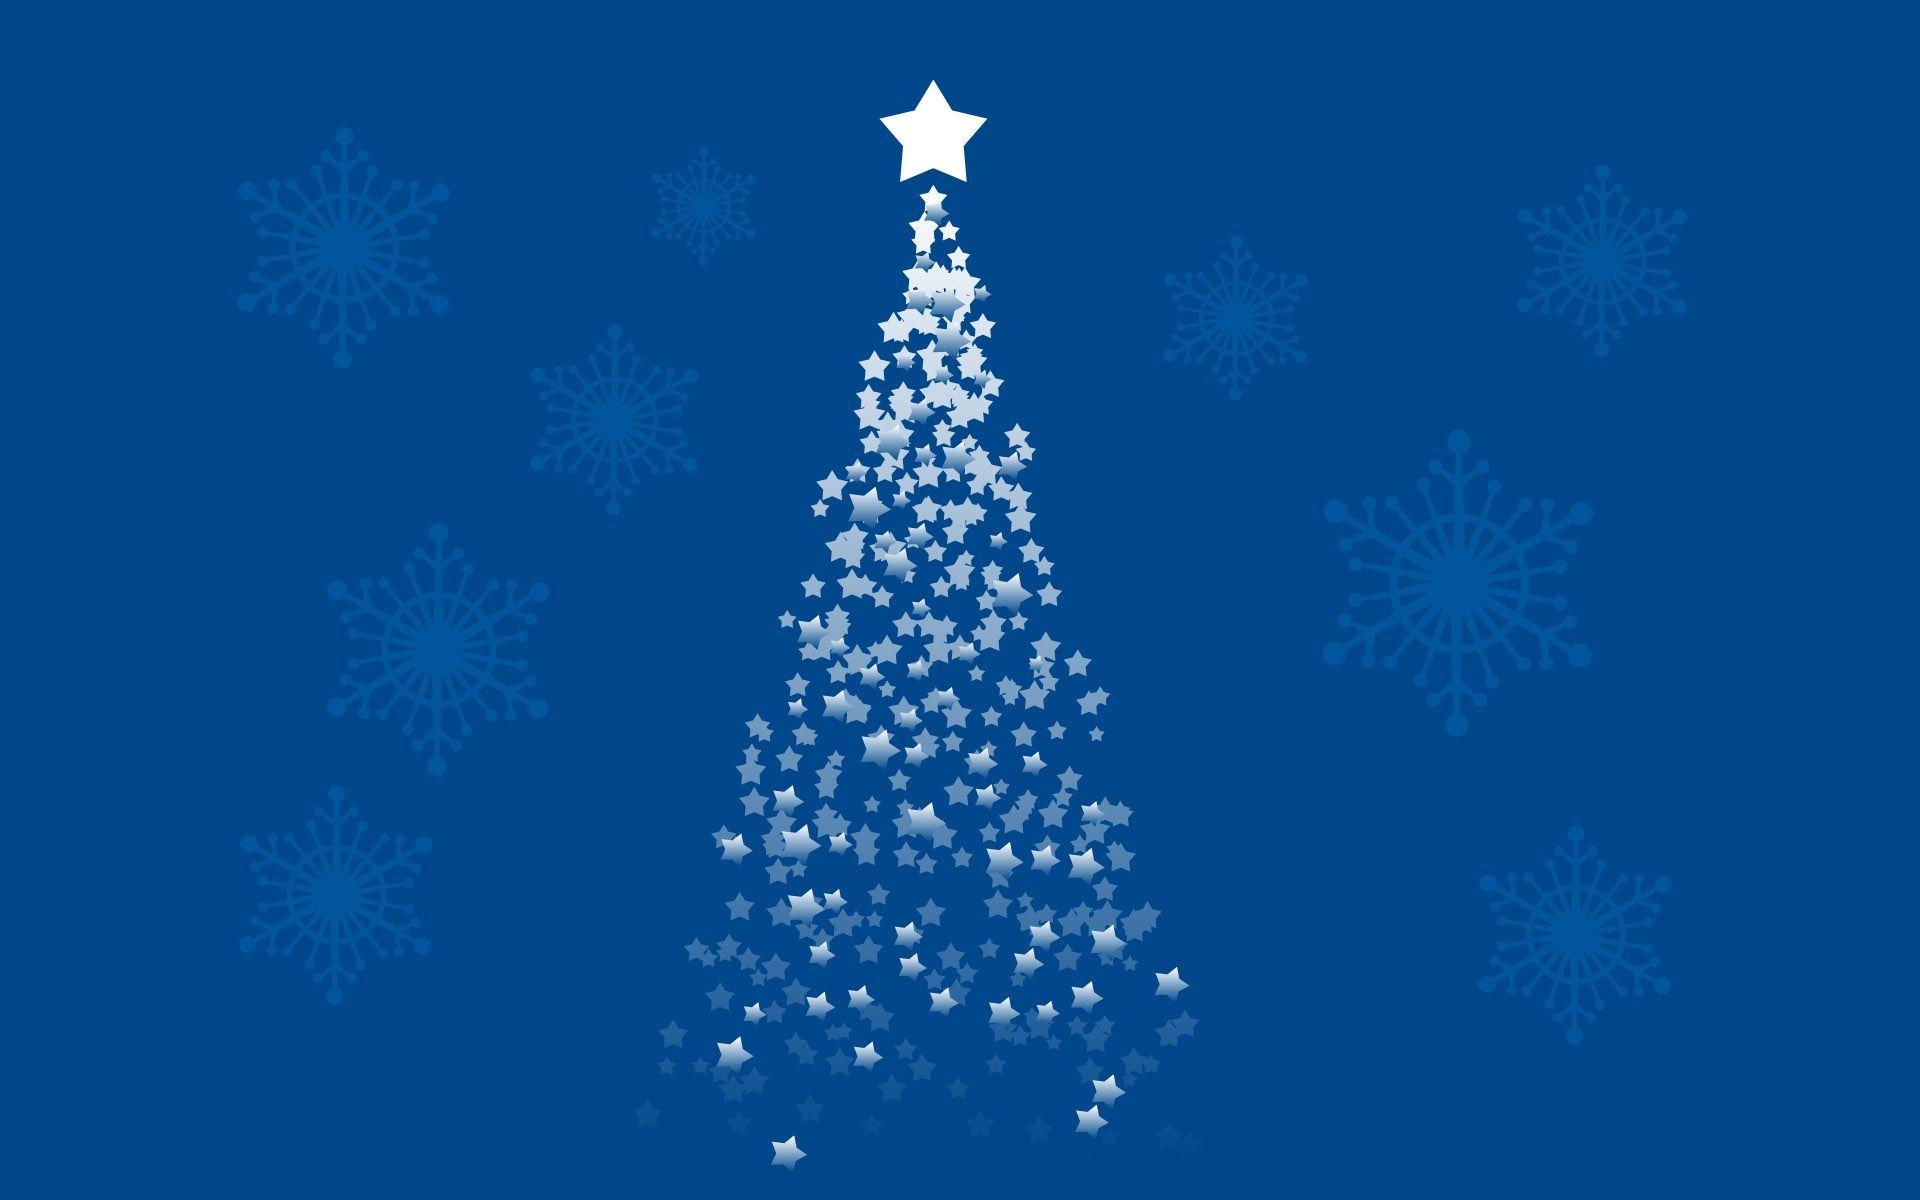 1920x1200 Blue Stars Christmas Tree Christmas Tree Wallpaper Tree Hd Wallpaper Christmas Wallpaper Hd